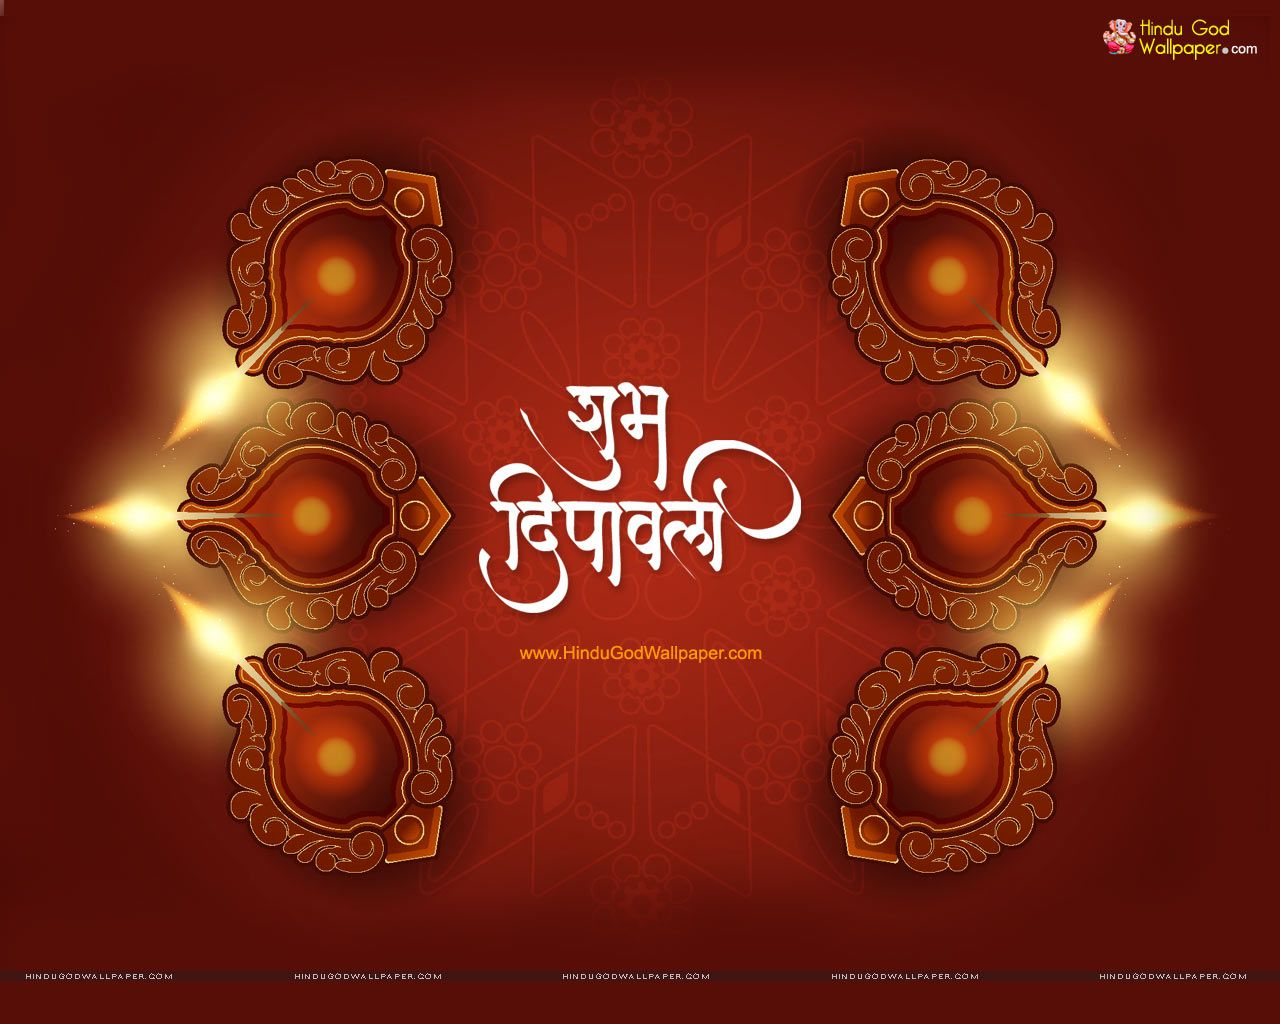 Diwali Diya - Happy Diwali Wallpapers Free Download | Diwali Diya ... for Diwali Diya Wallpaper  174mzq